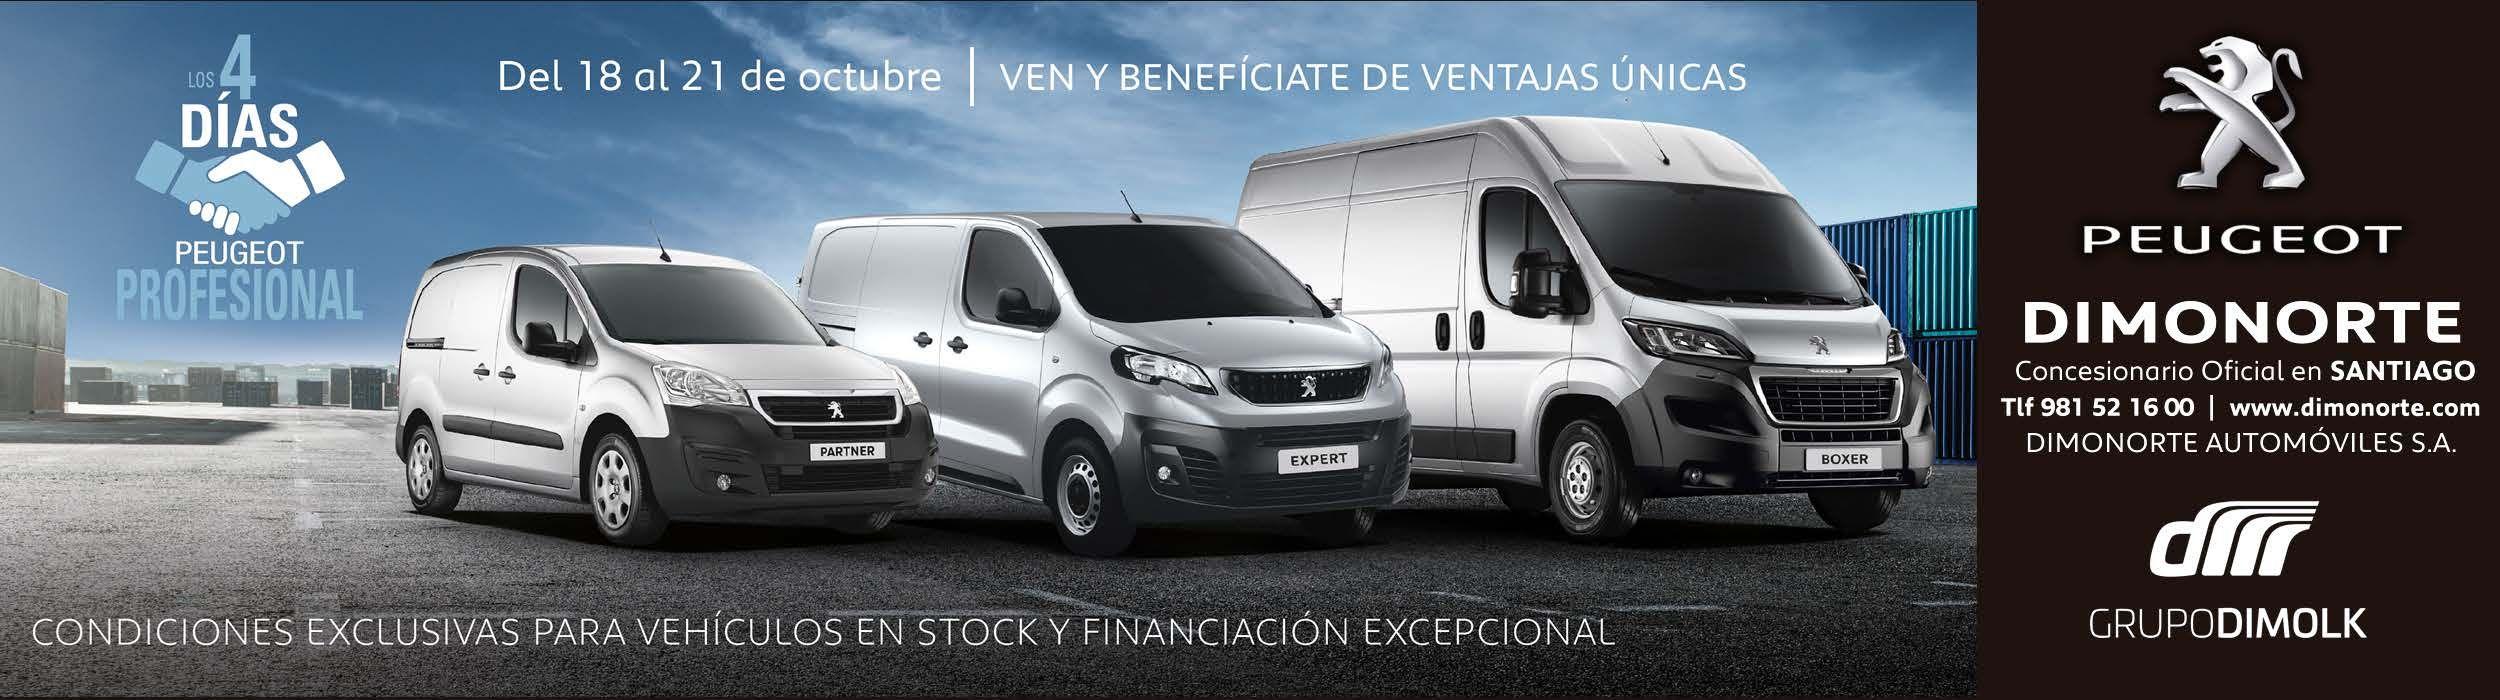 4 días Peugeot Profesional del 18 al 21 de Octubre